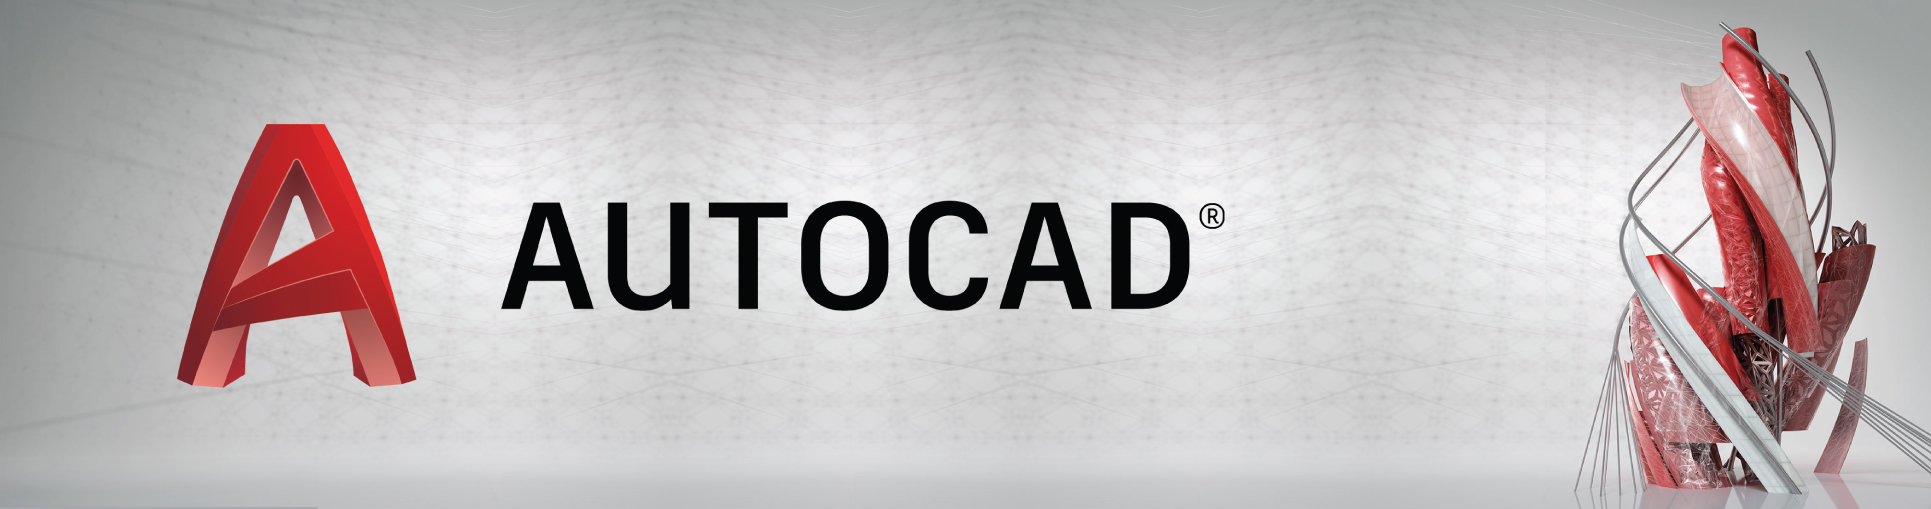 AutoCAD-1